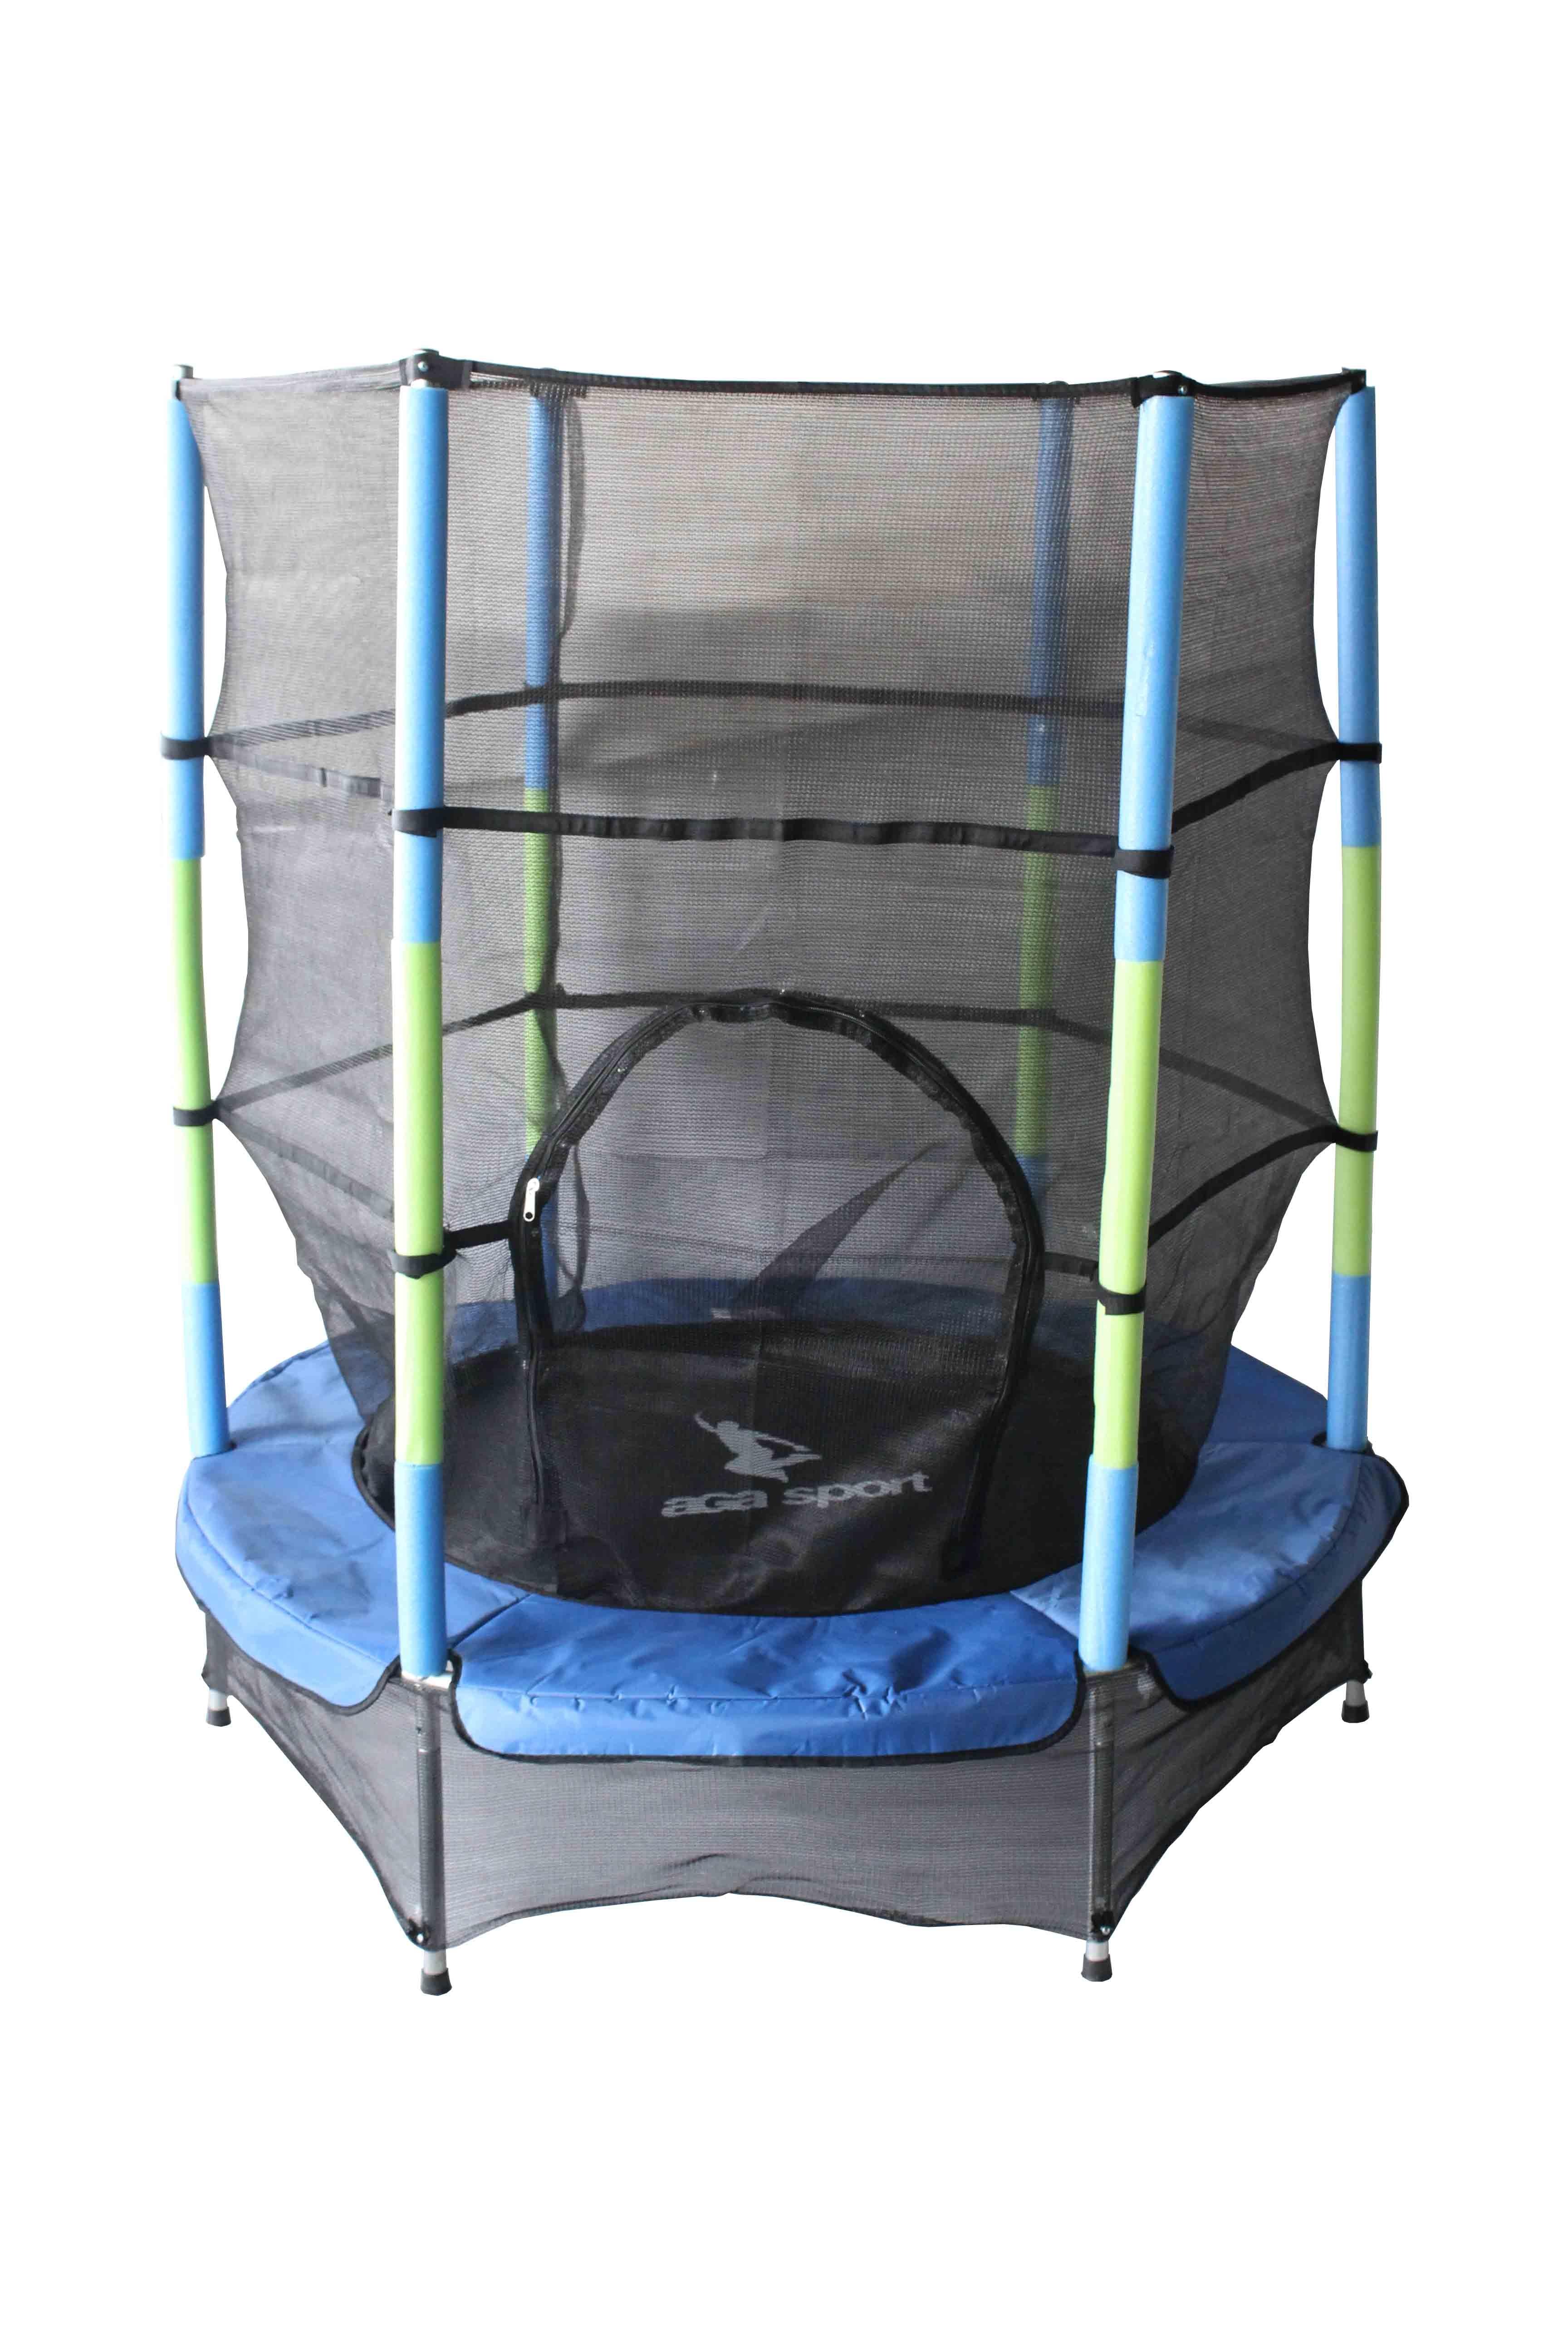 Trampolína Sport Indoor 140 cm - modrá